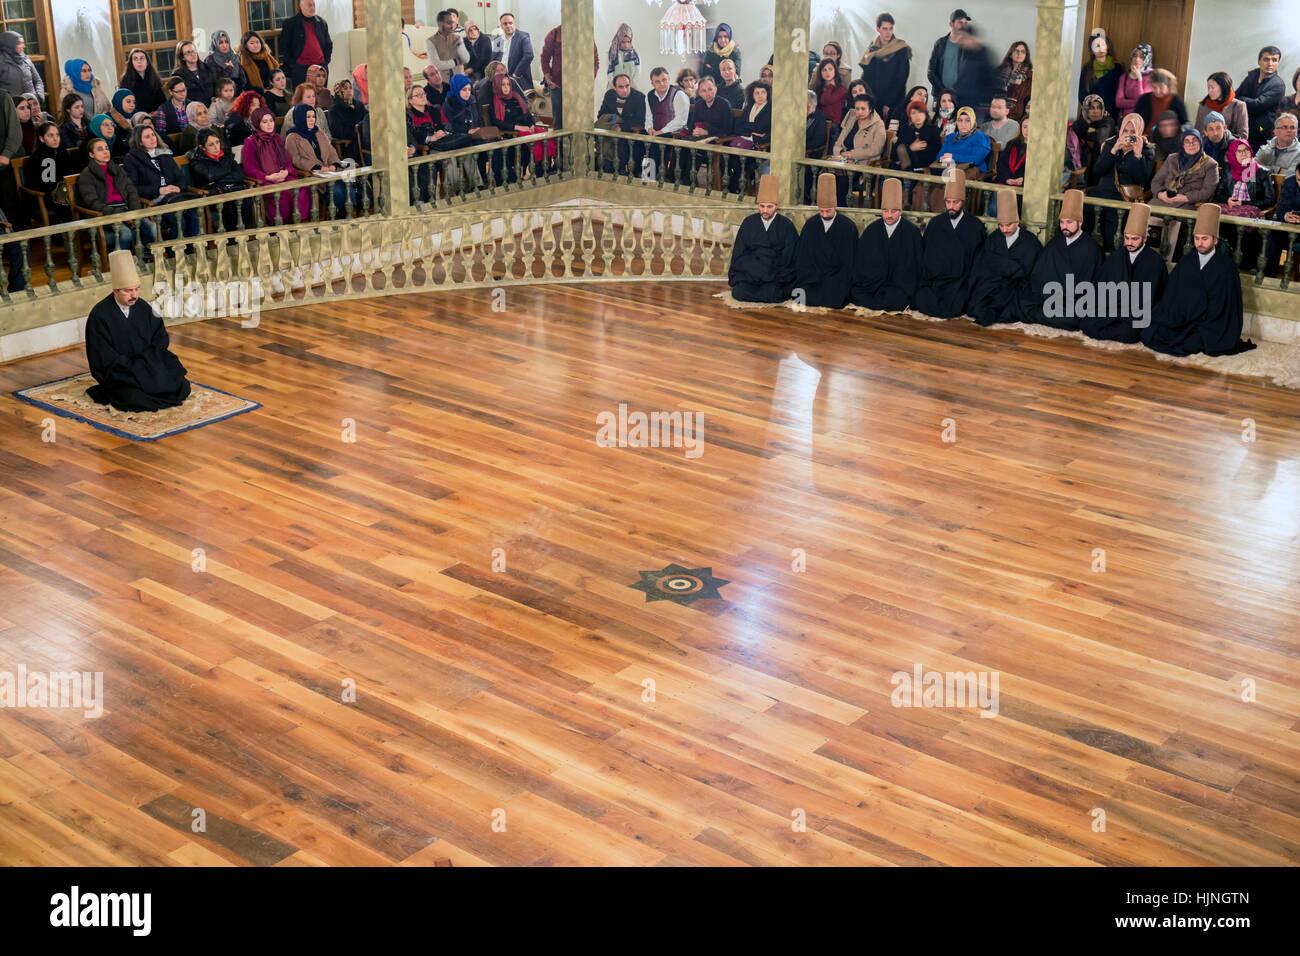 Istanbul, Turkey - January 6, 2016: Tourists visits watch Sema Ceremony in Yenikapi Mevlevihanesi, Istanbul, Turkey - Stock Image